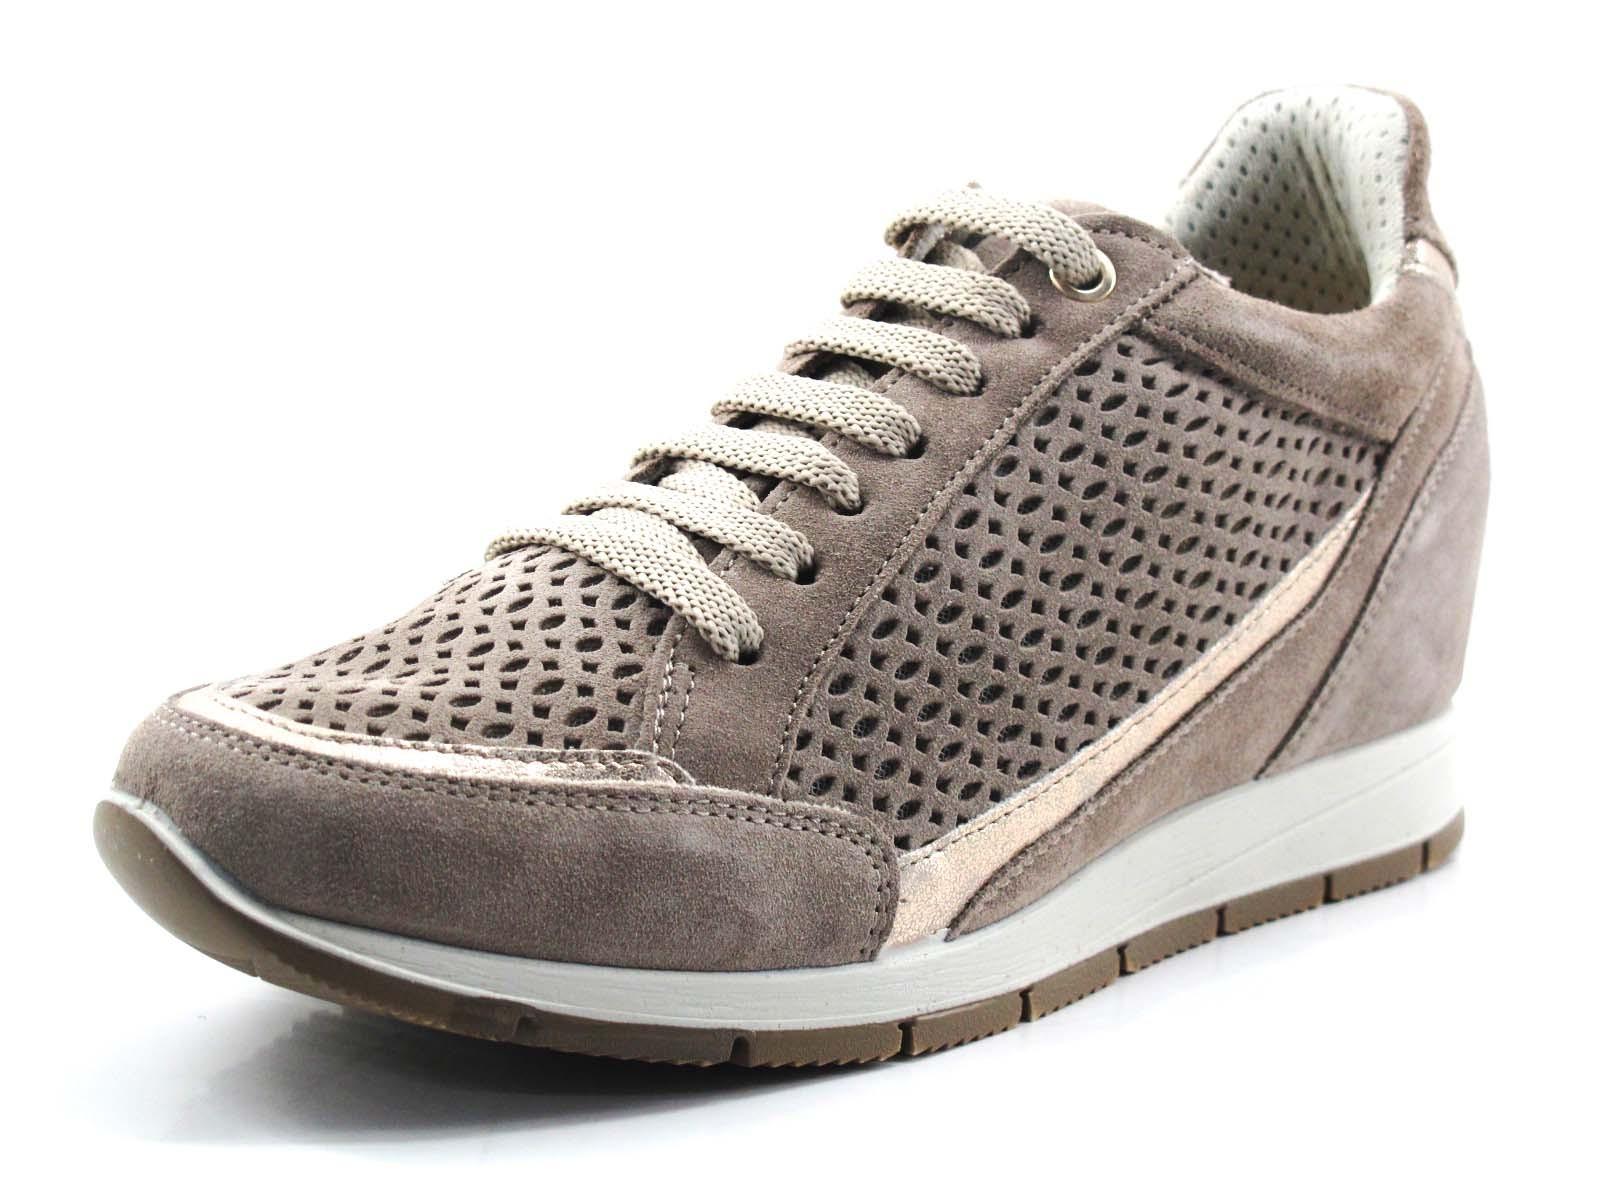 Comprar zapatos IMAC cuña escondida beige en Dino Zapatos